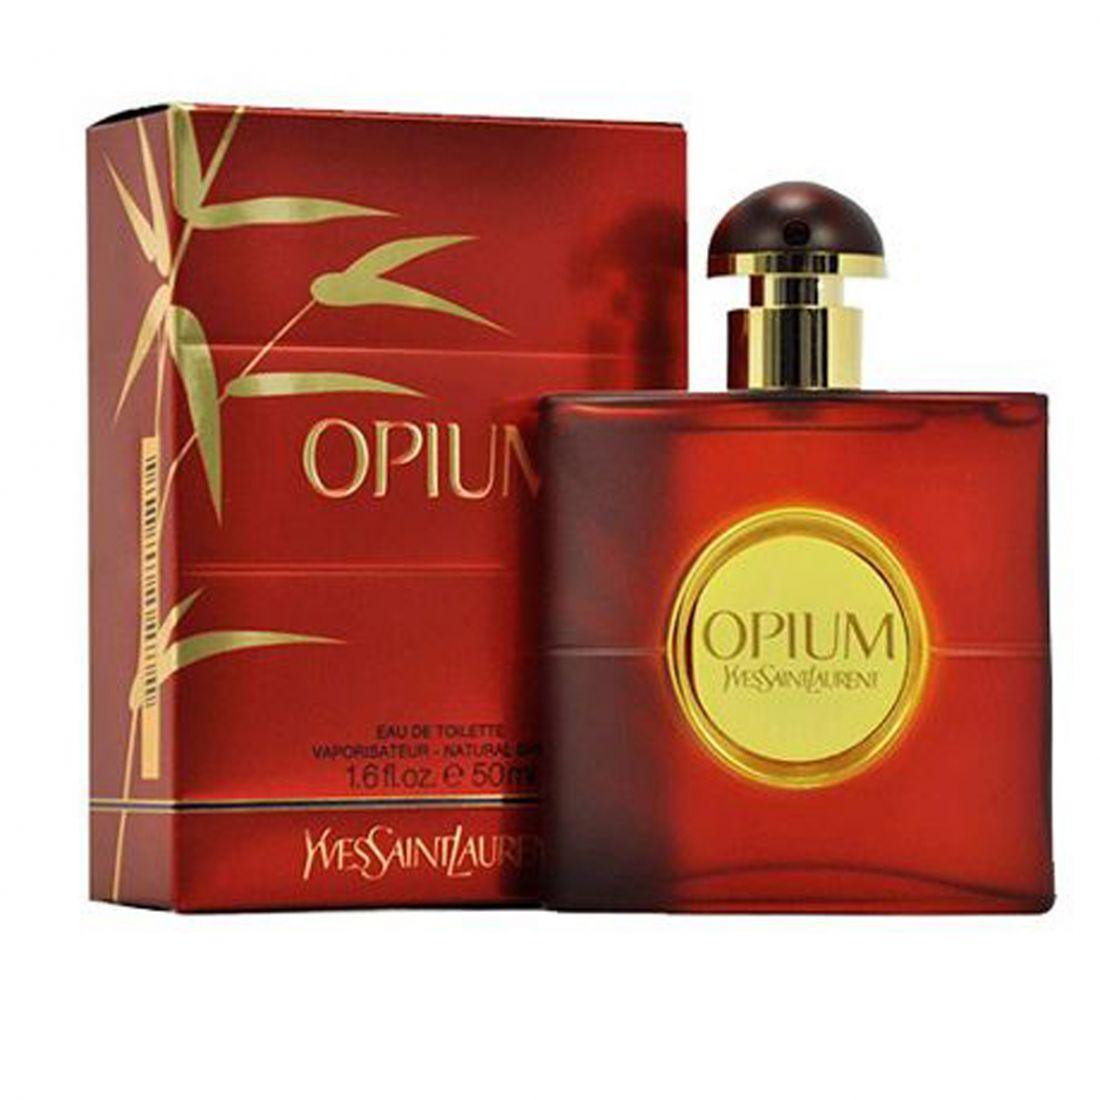 Yves Saint Laurent - Opium, 50 ml